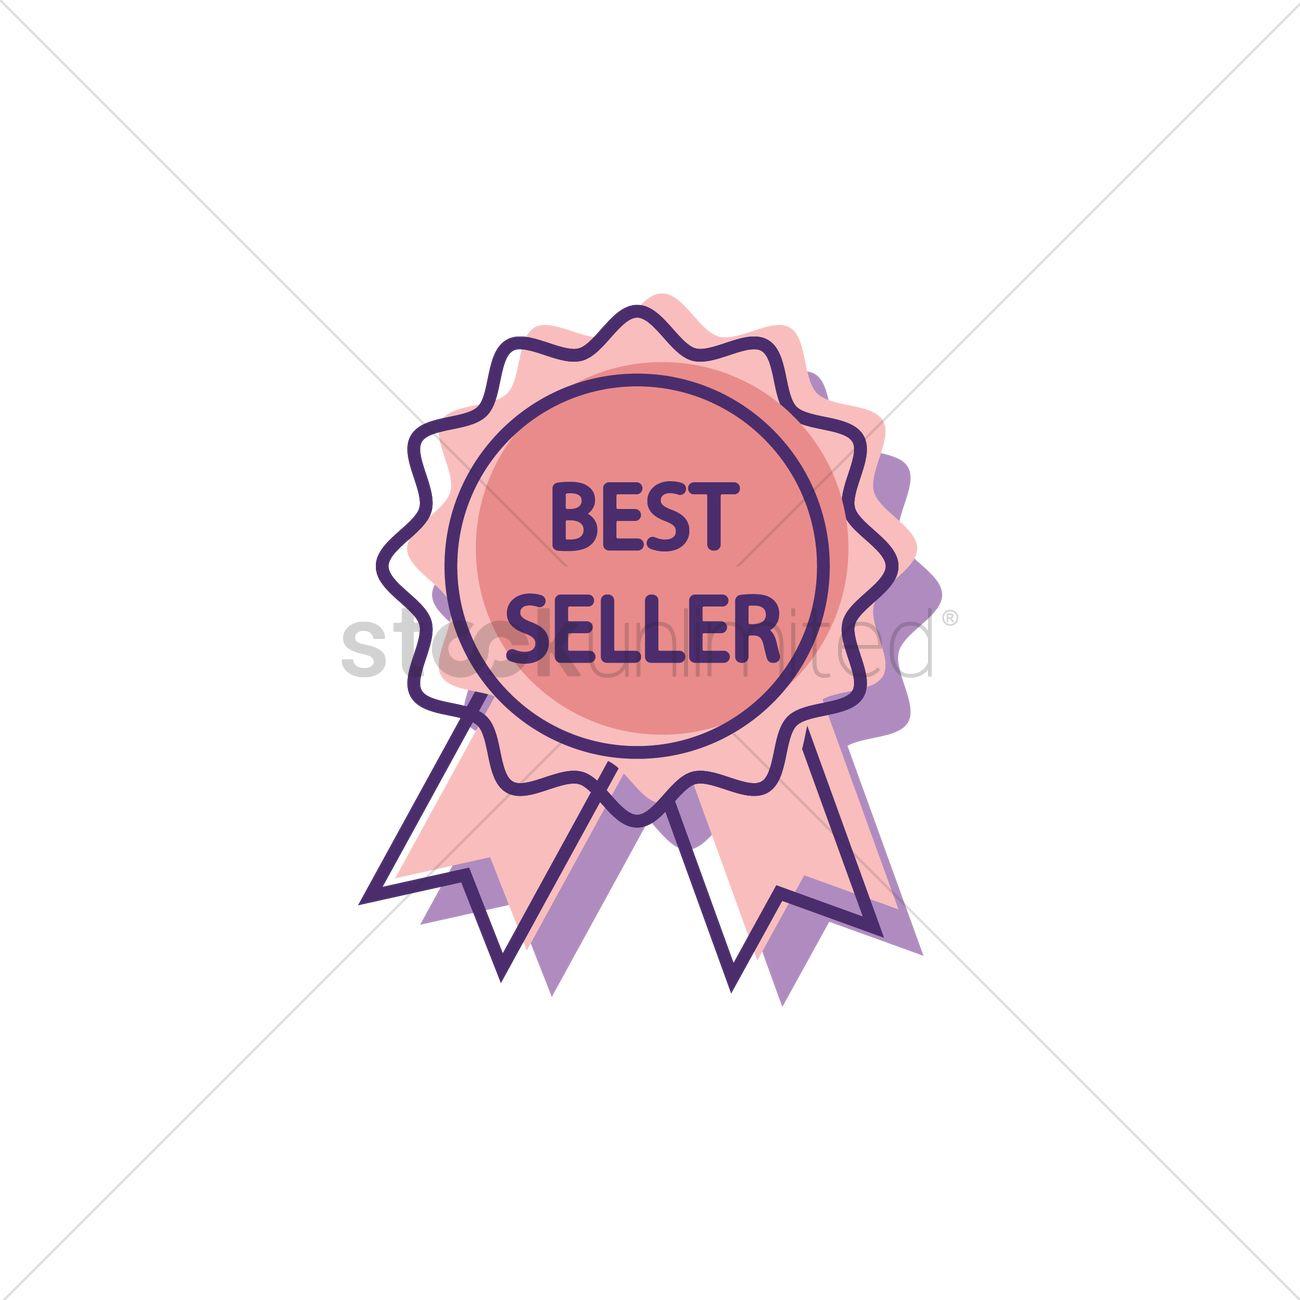 Best seller ribbon badge Vector Image - 2019897 | StockUnlimited